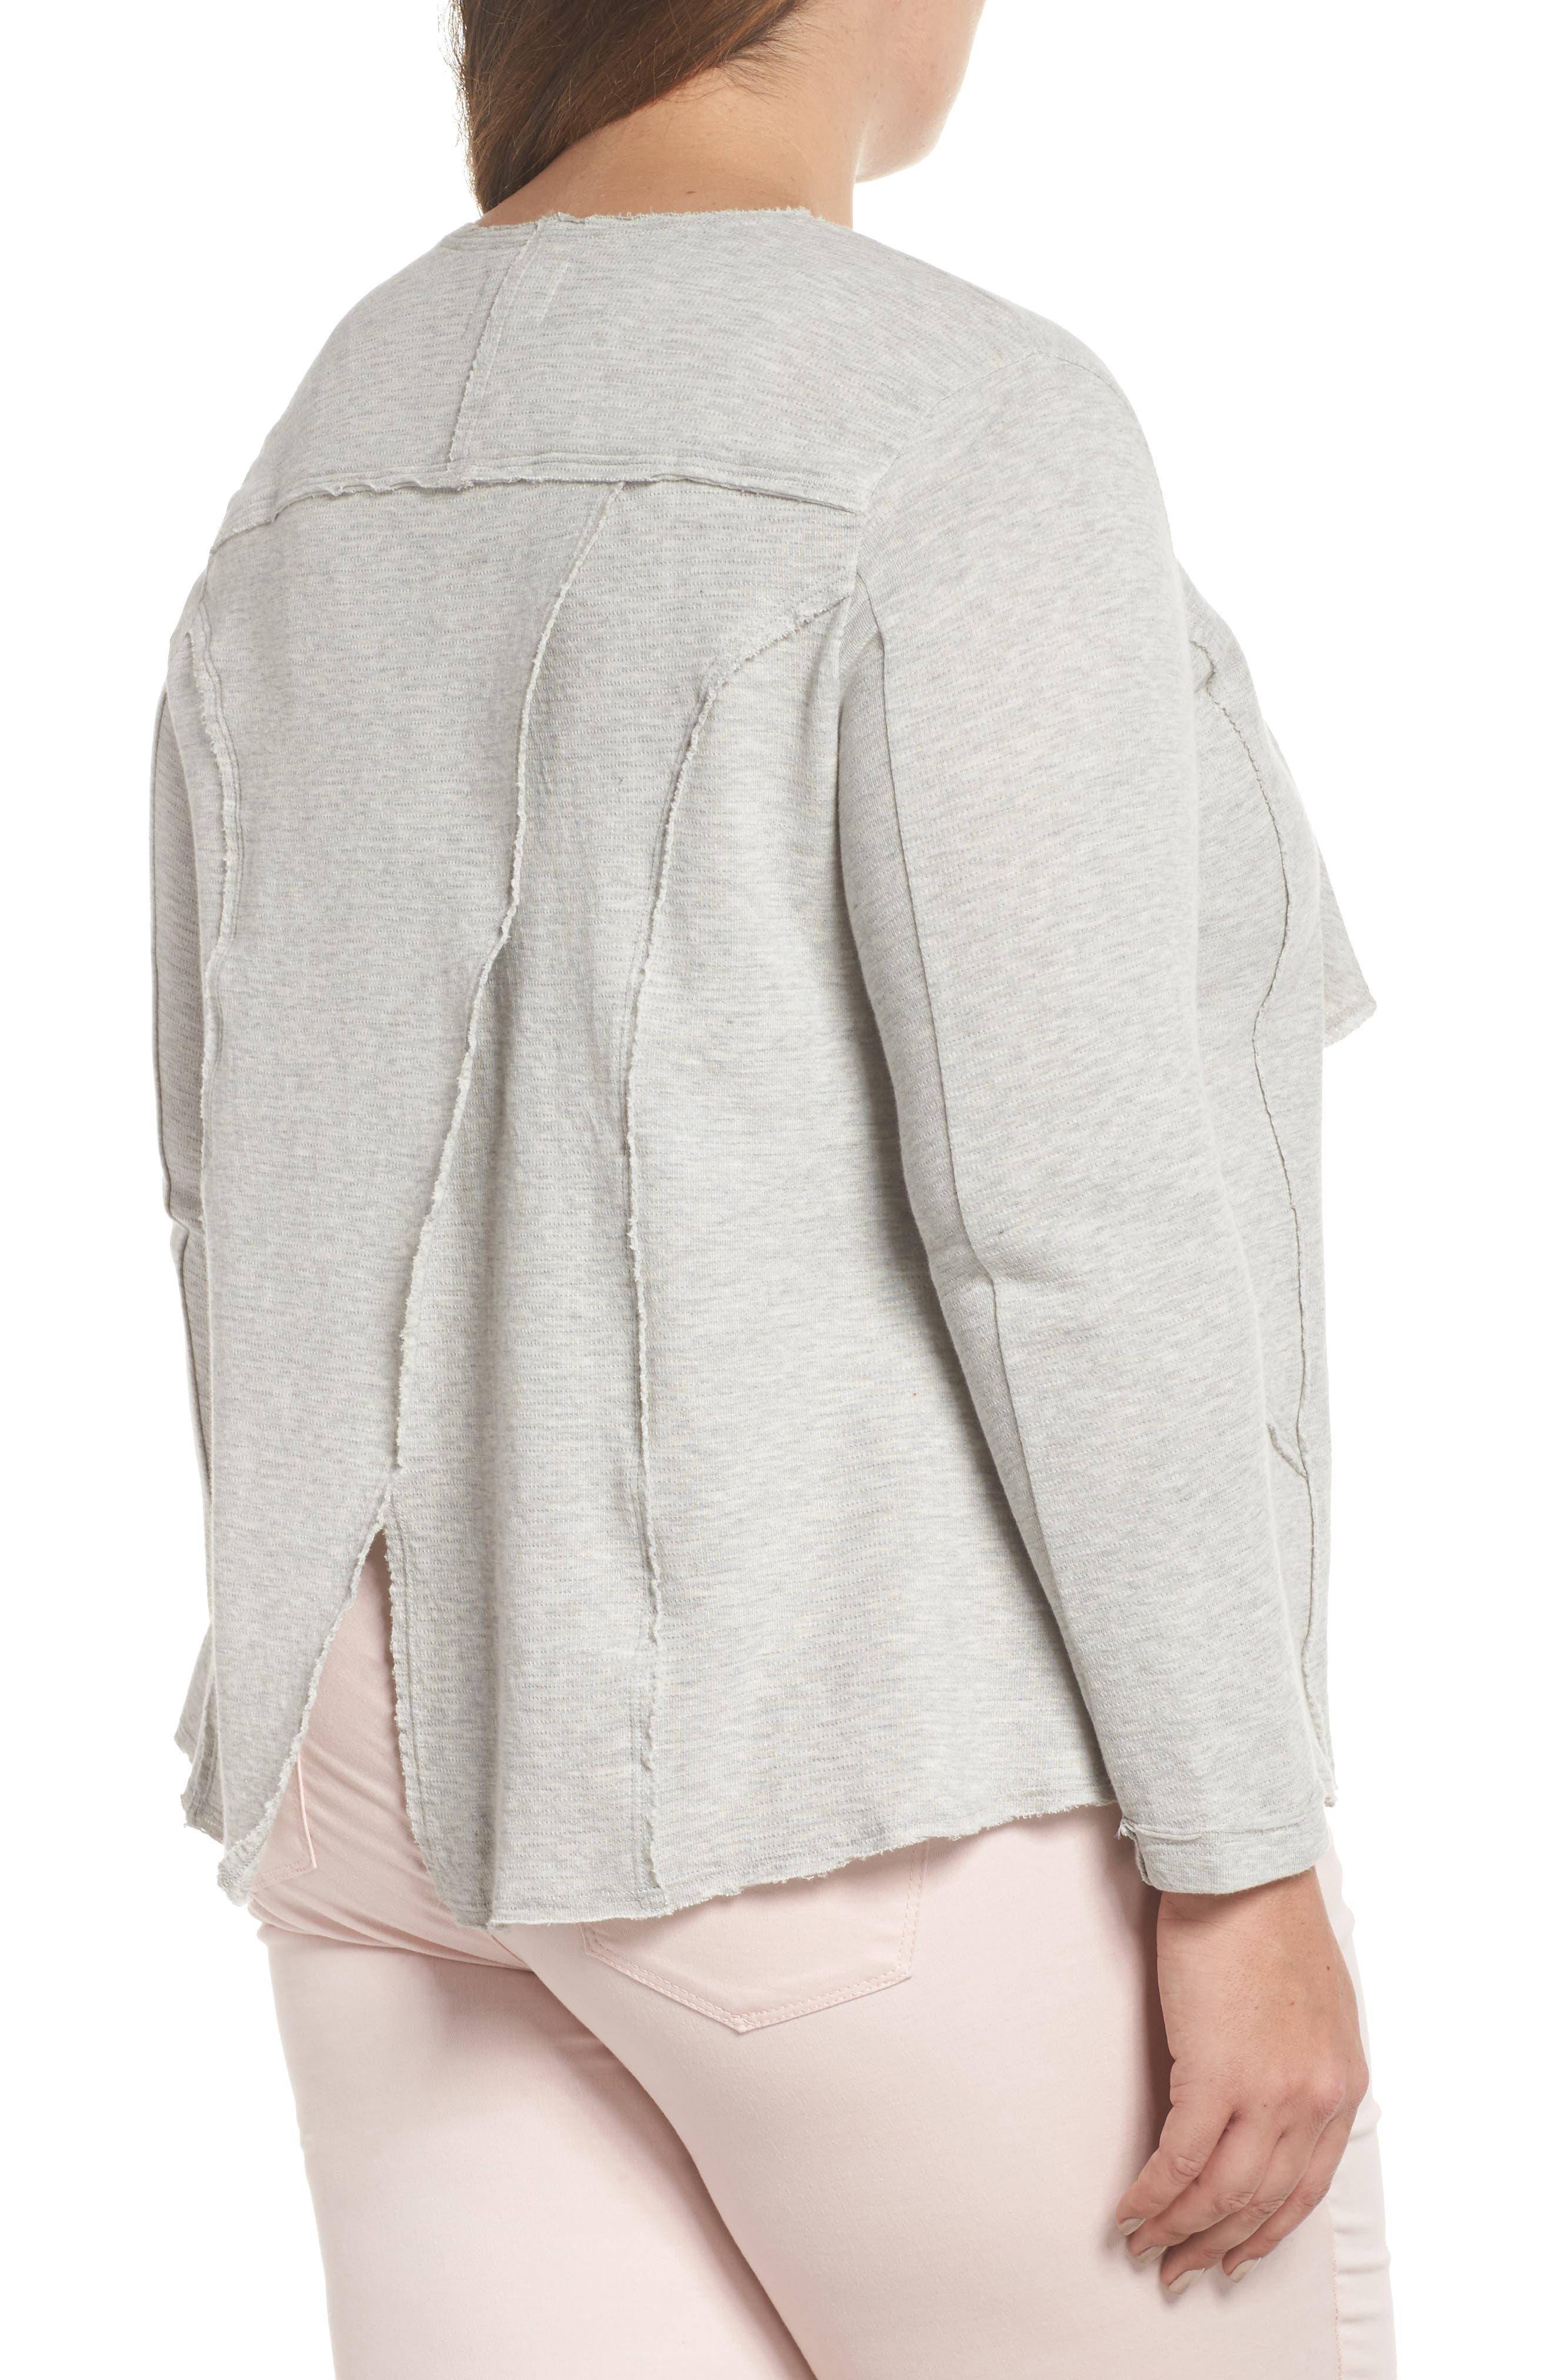 Alternate Image 2  - Caslon® Knit Drape Jacket (Plus Size)